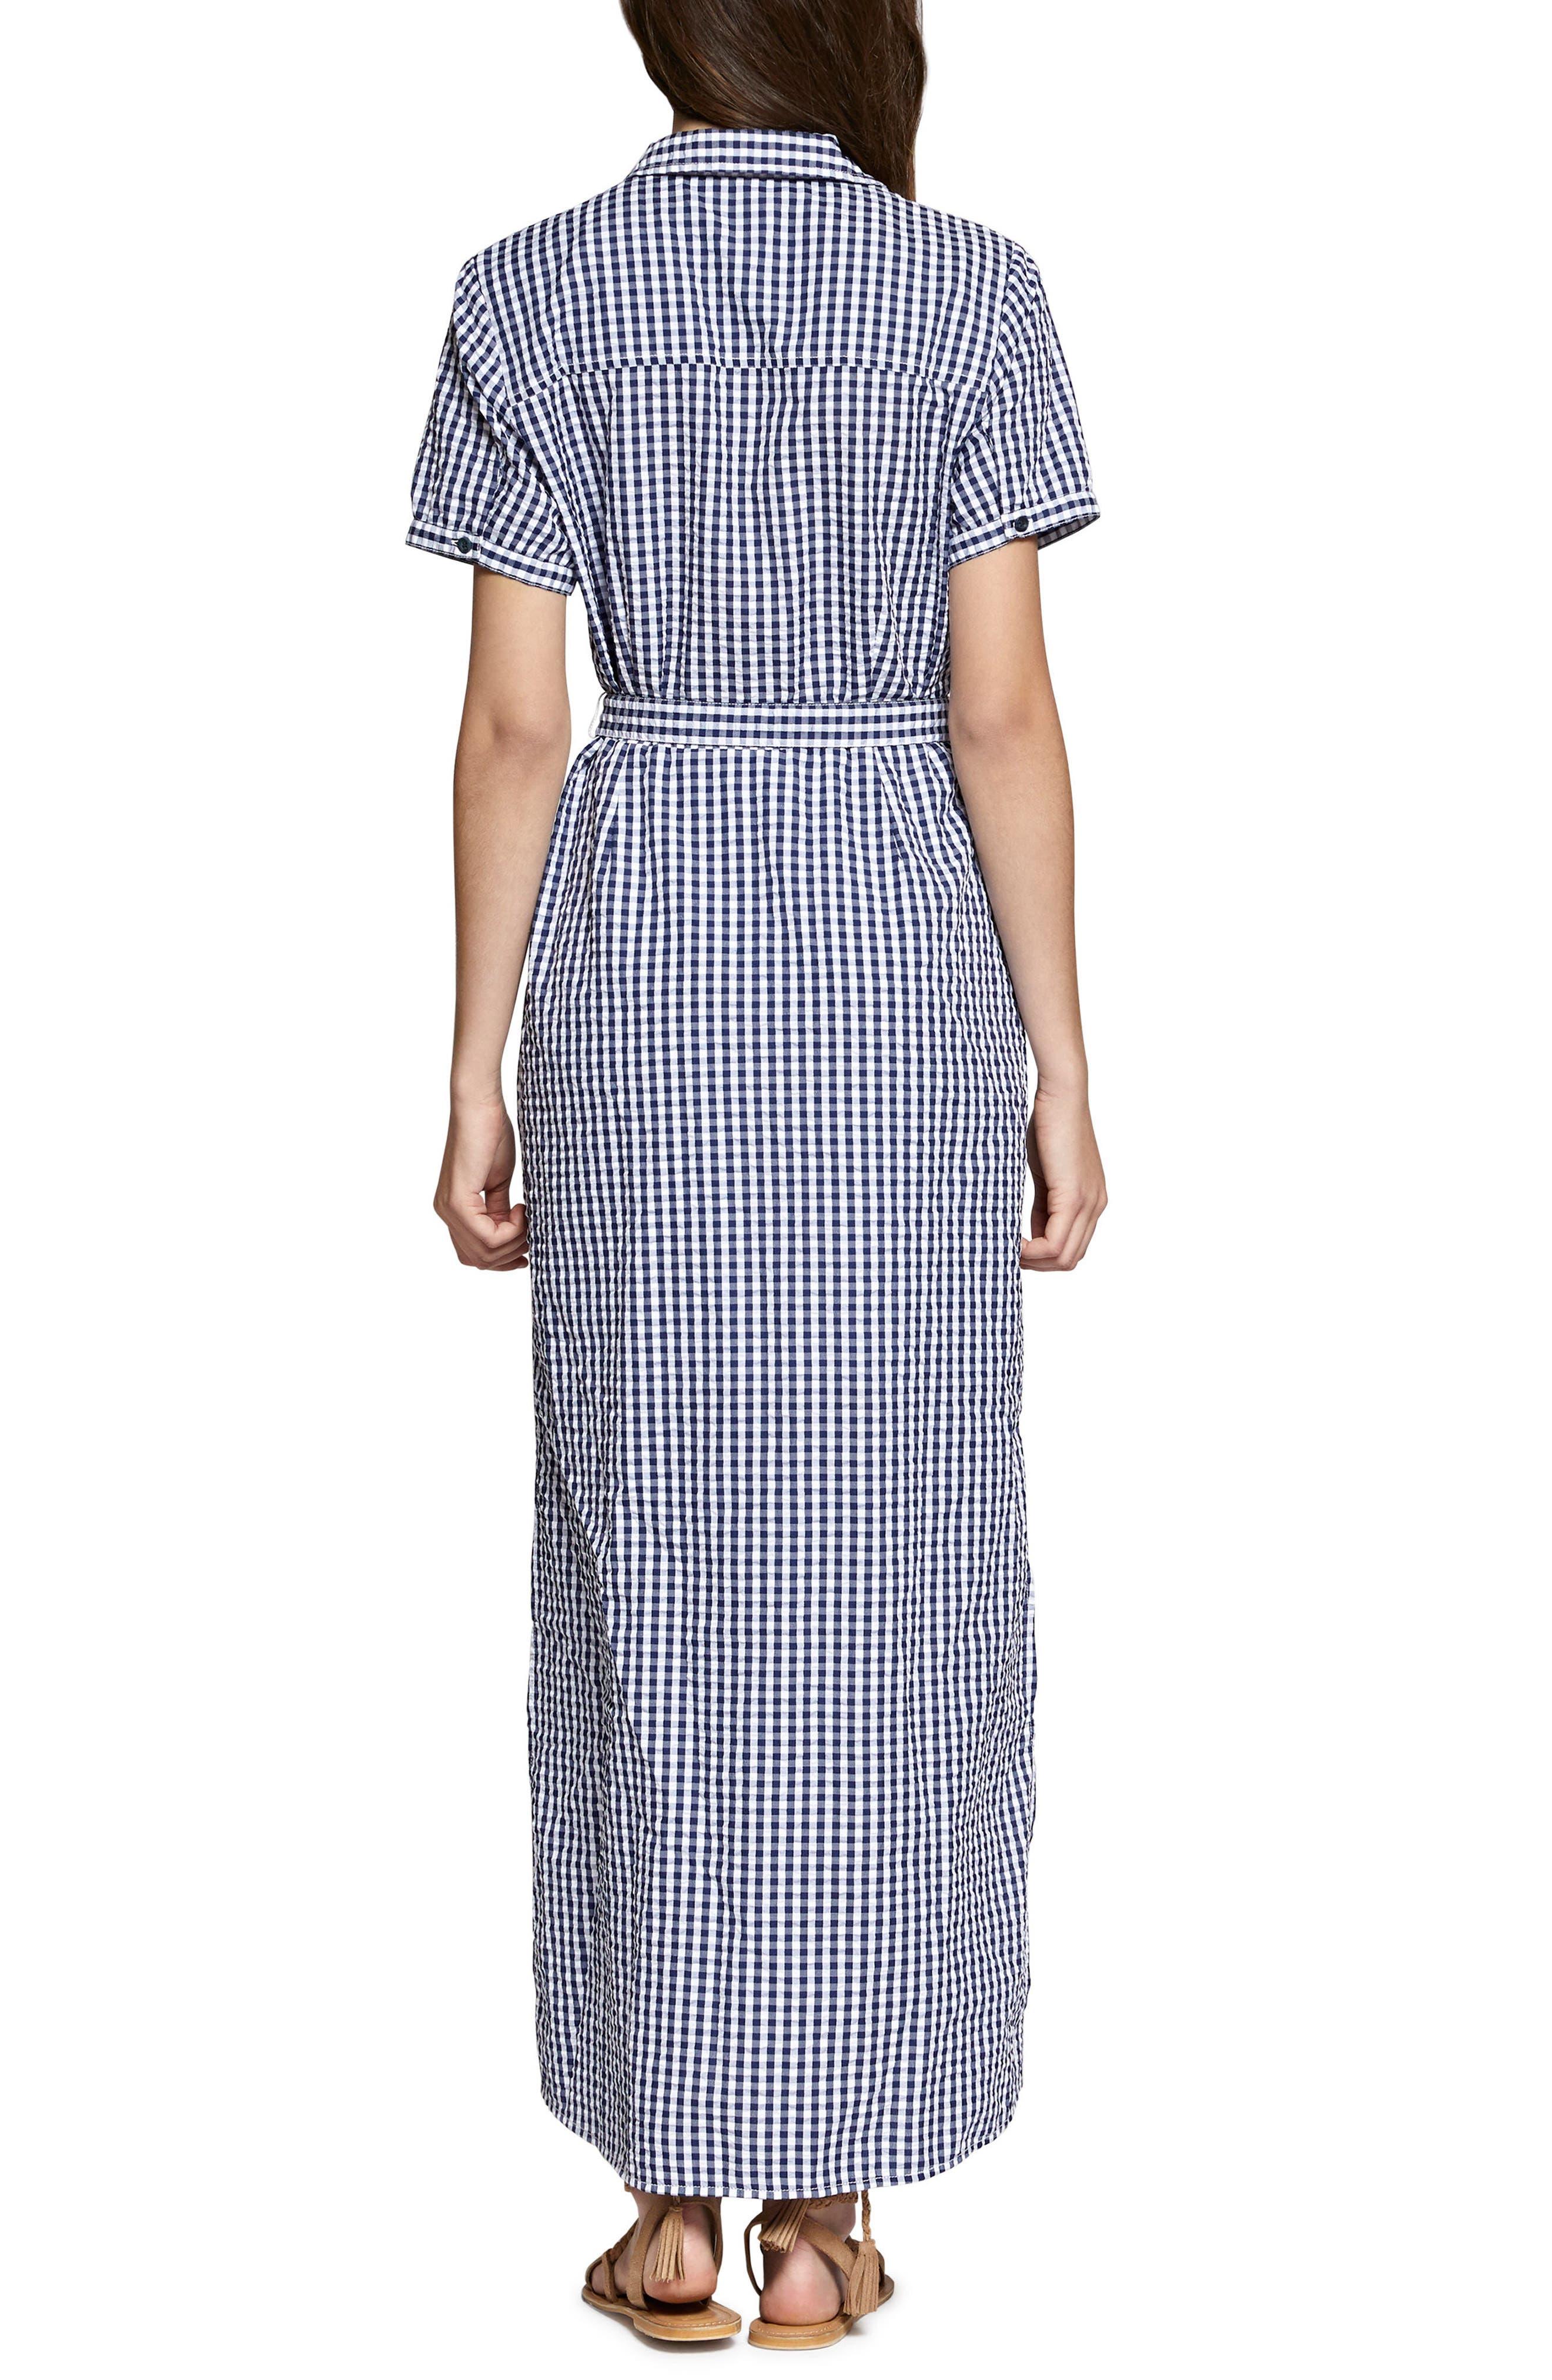 Blue Dawn Maxi Dress,                             Alternate thumbnail 2, color,                             452